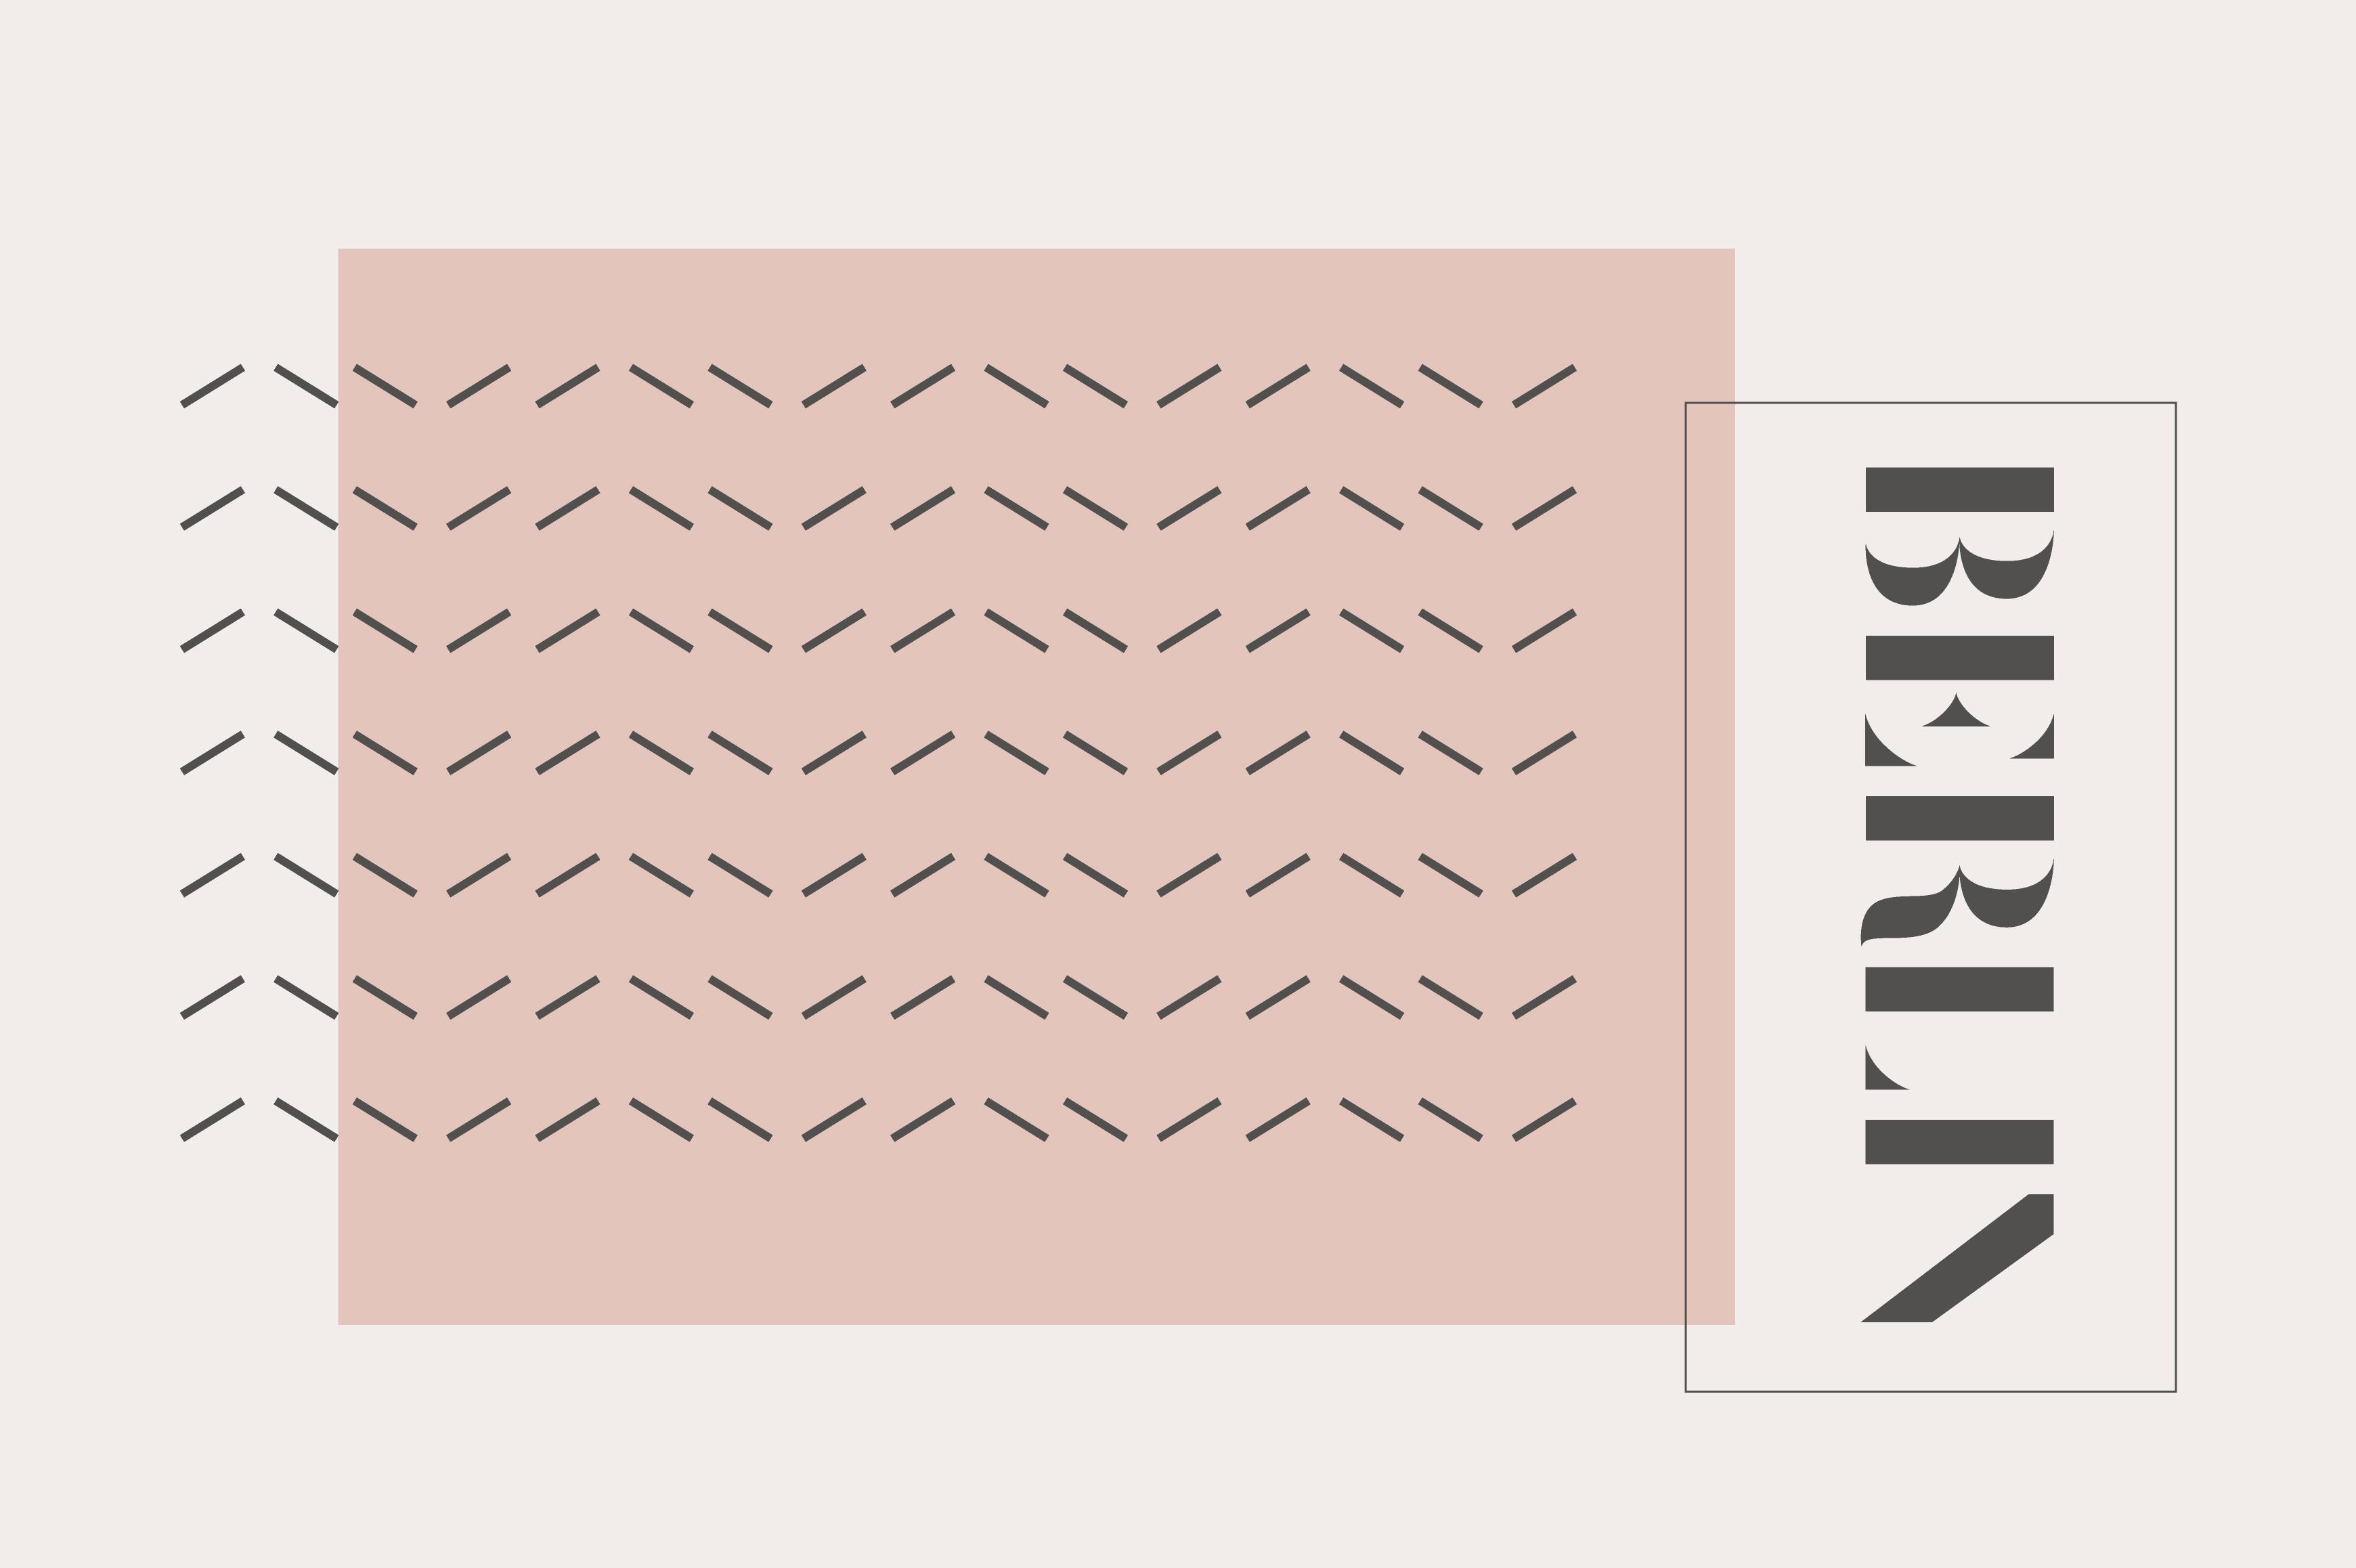 Catalogue - A Minimal Typeface example image 2